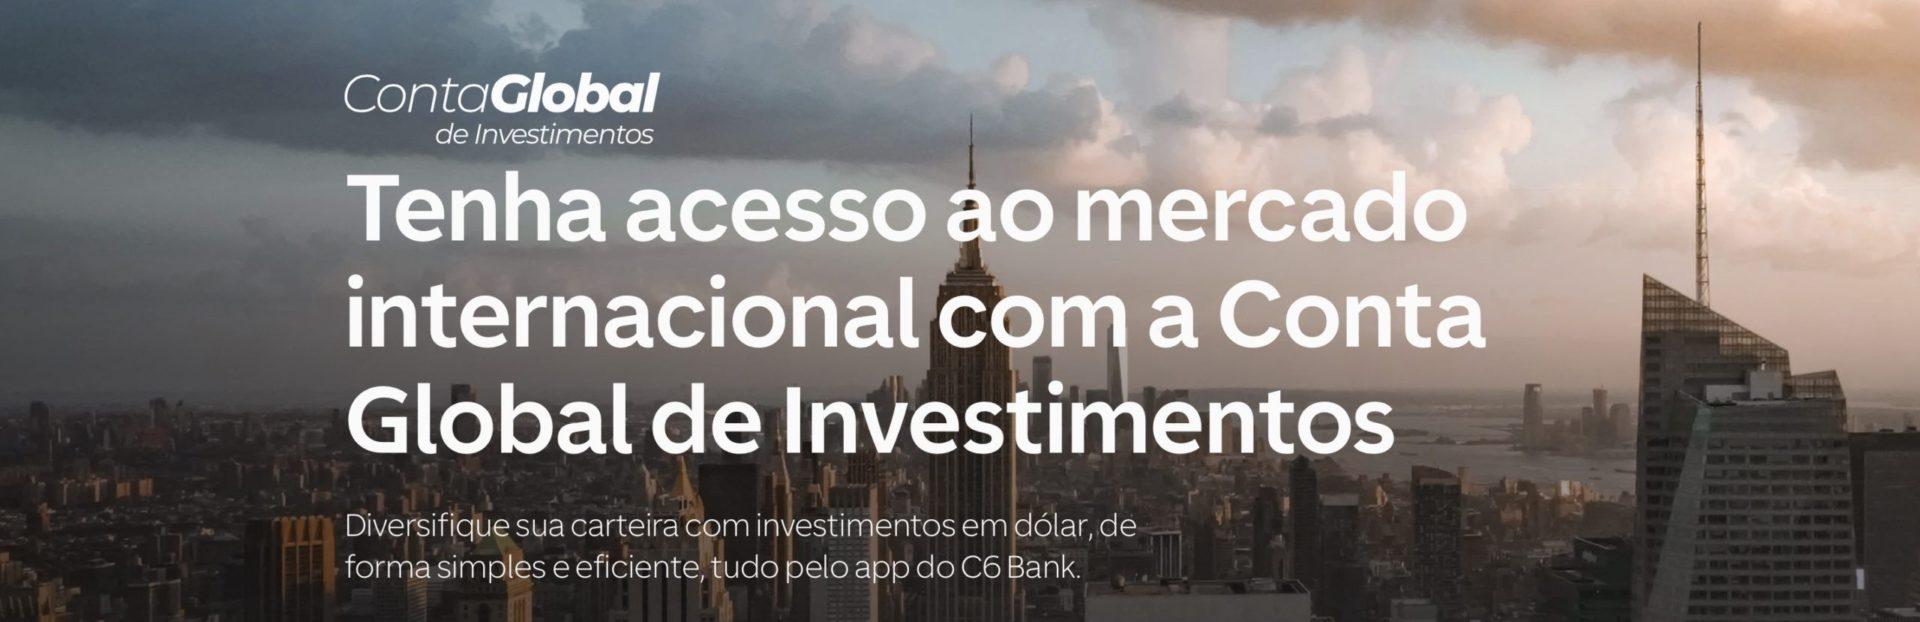 c6 conta internacional investimentos